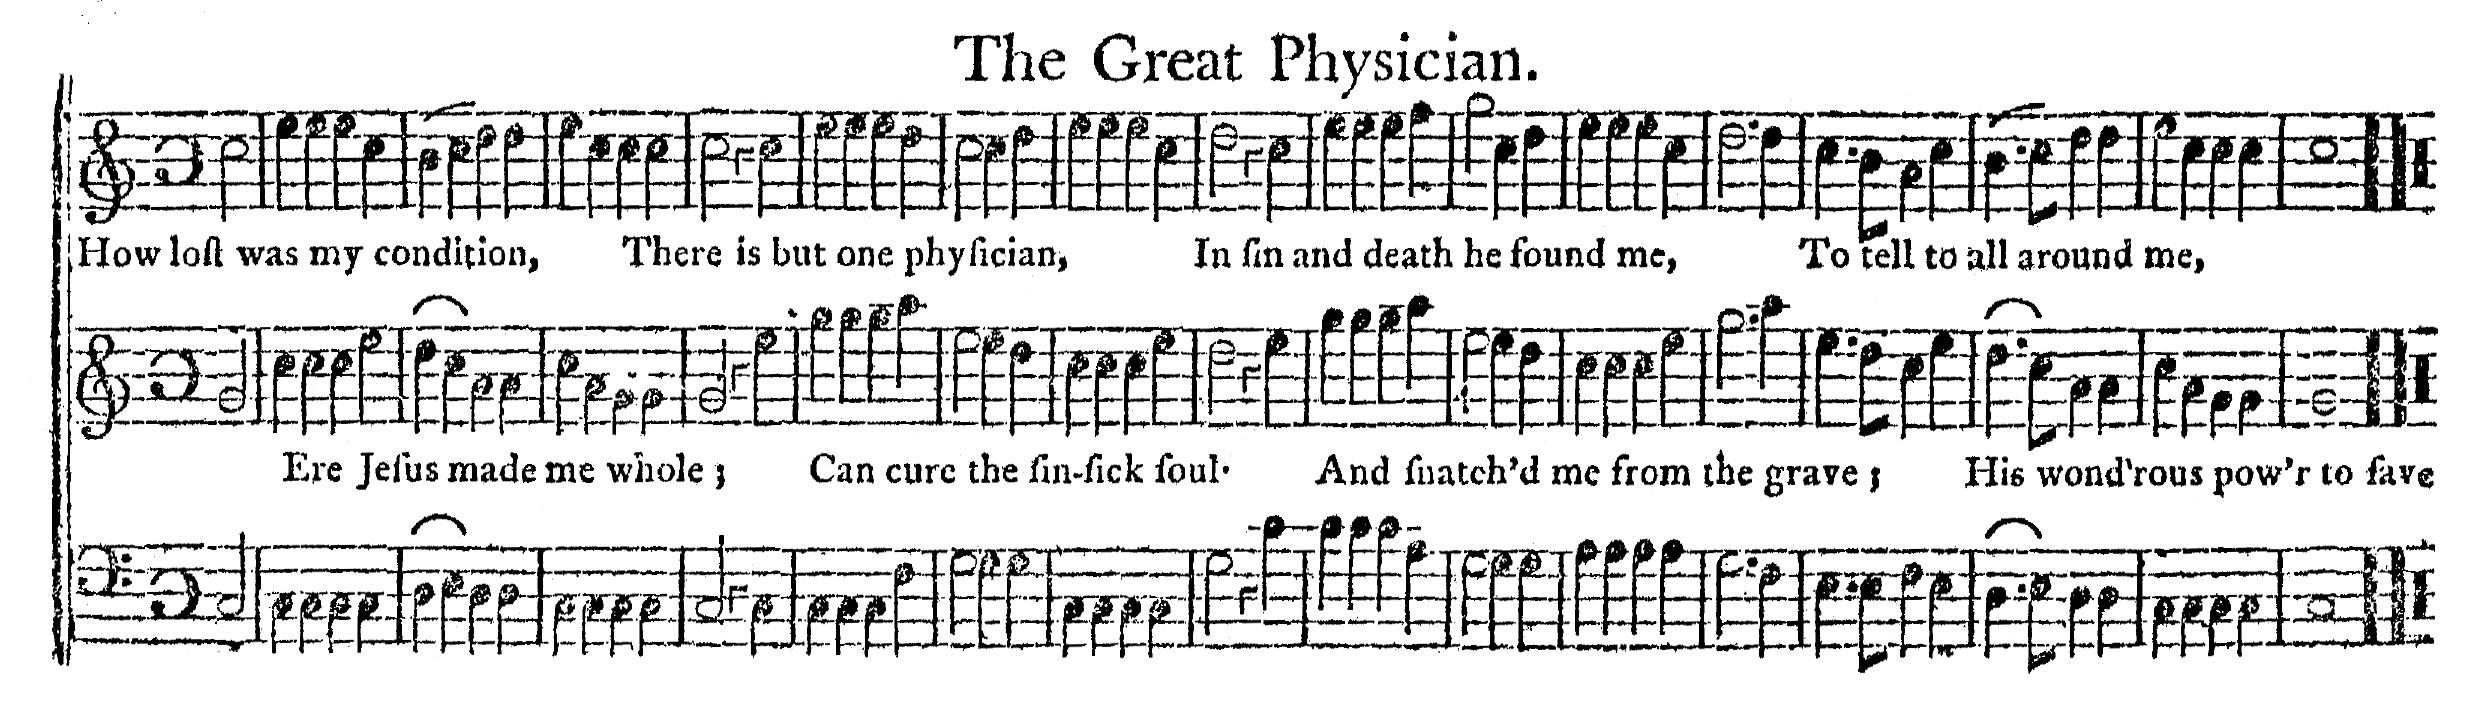 GreatPhysician-ChristianHarmony-1805-1.jpg